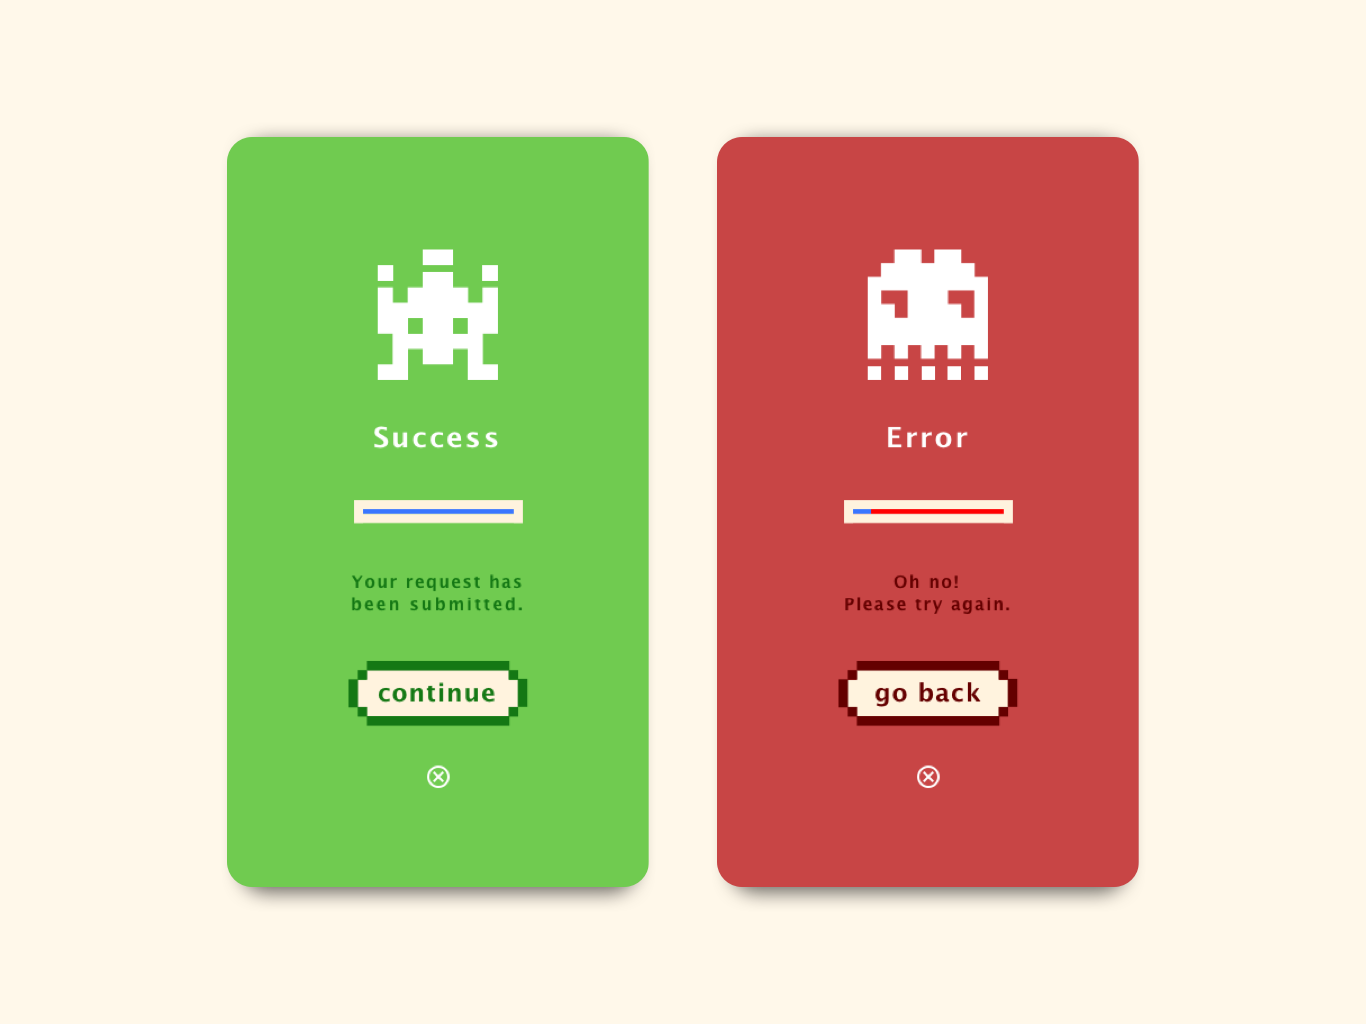 daily ui 011 - sign up red green error success genie signup 011 dailyui011 pixels pixelart pixel app design ui dailyui